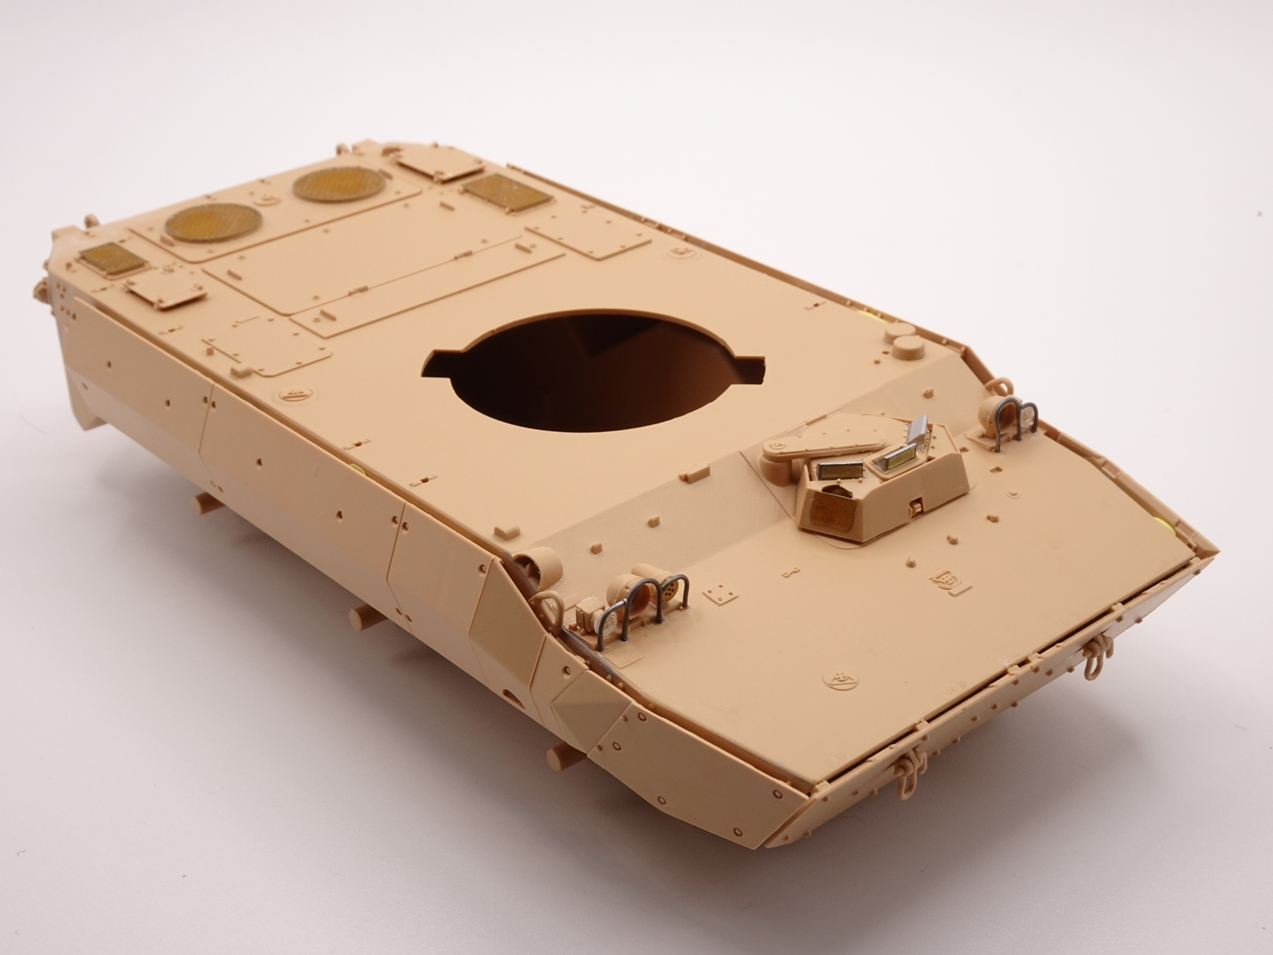 [Tiger Model] AMX-10RCR réf. 4602 - 1/35 - Page 2 Amx10-1907-2